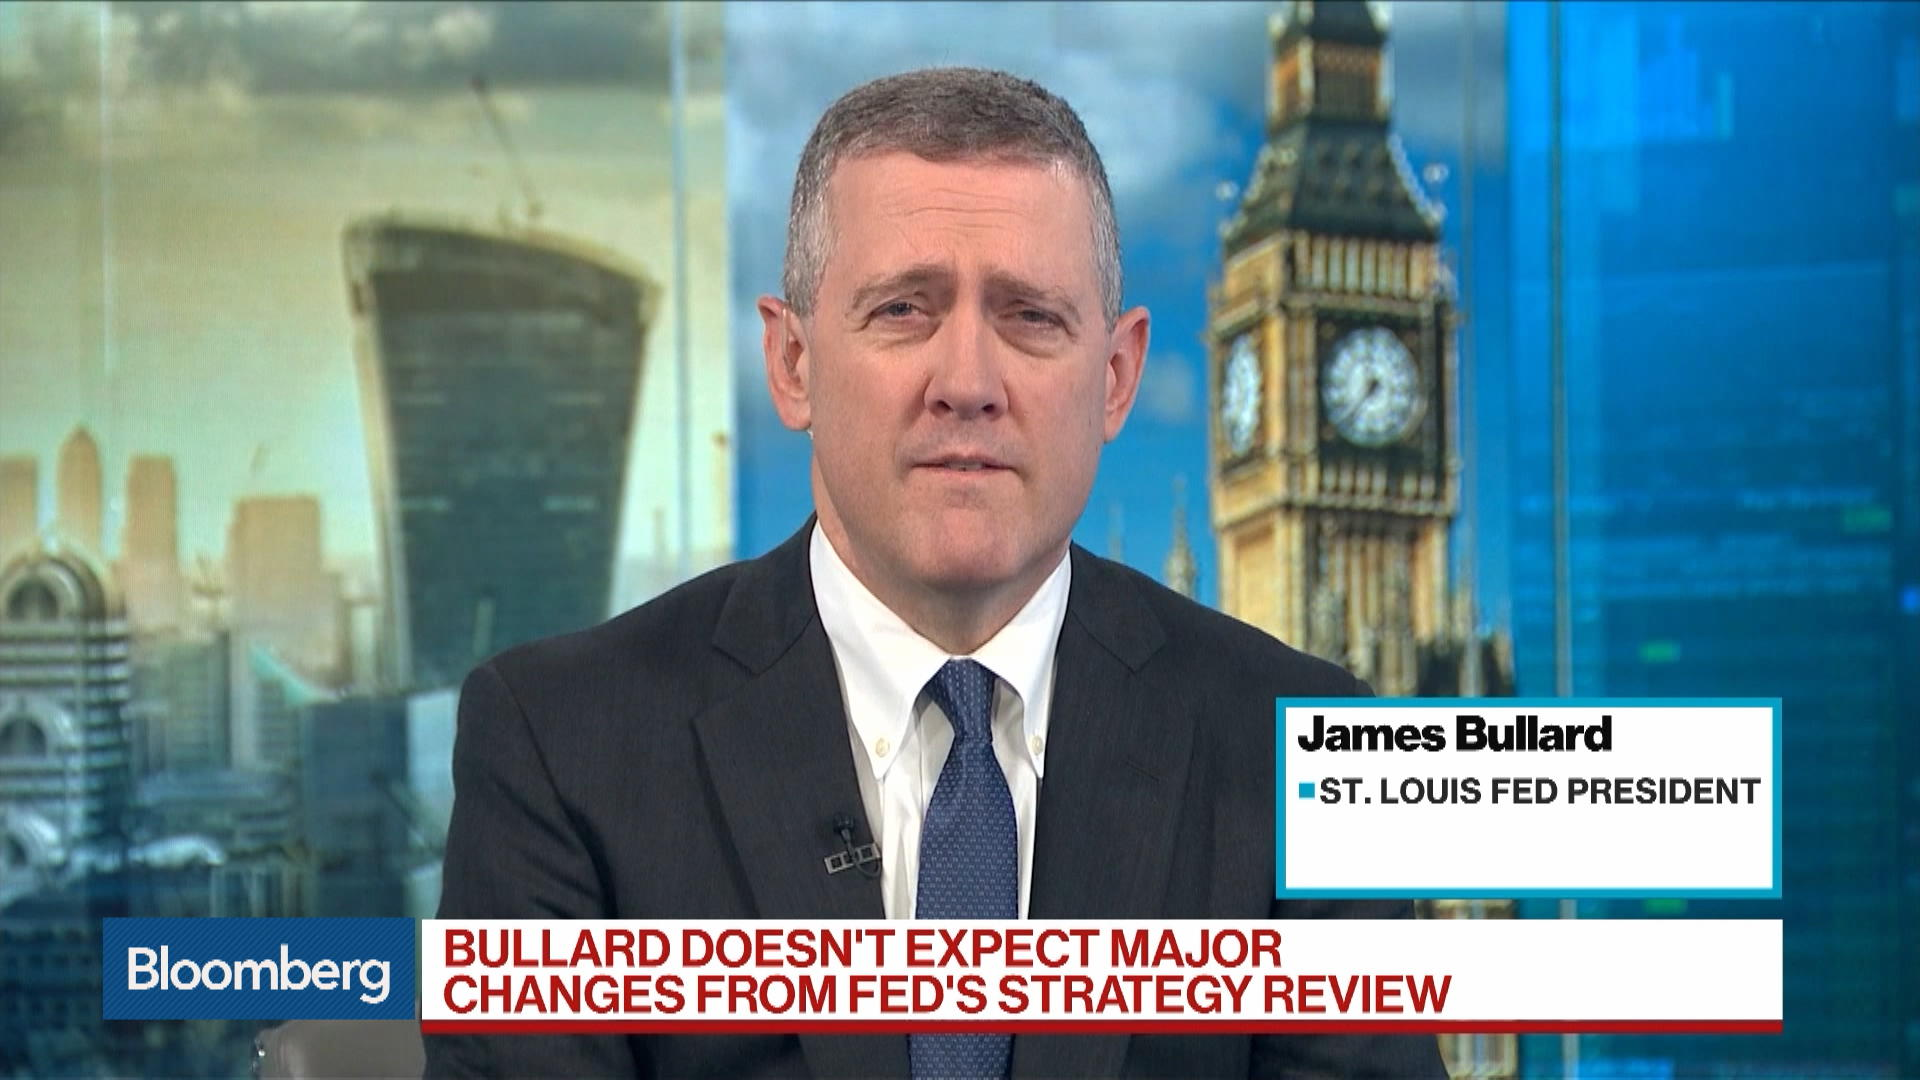 James Bullard, Federal Reserve Bank of St. Louis President, on Outlook for Interest Rates